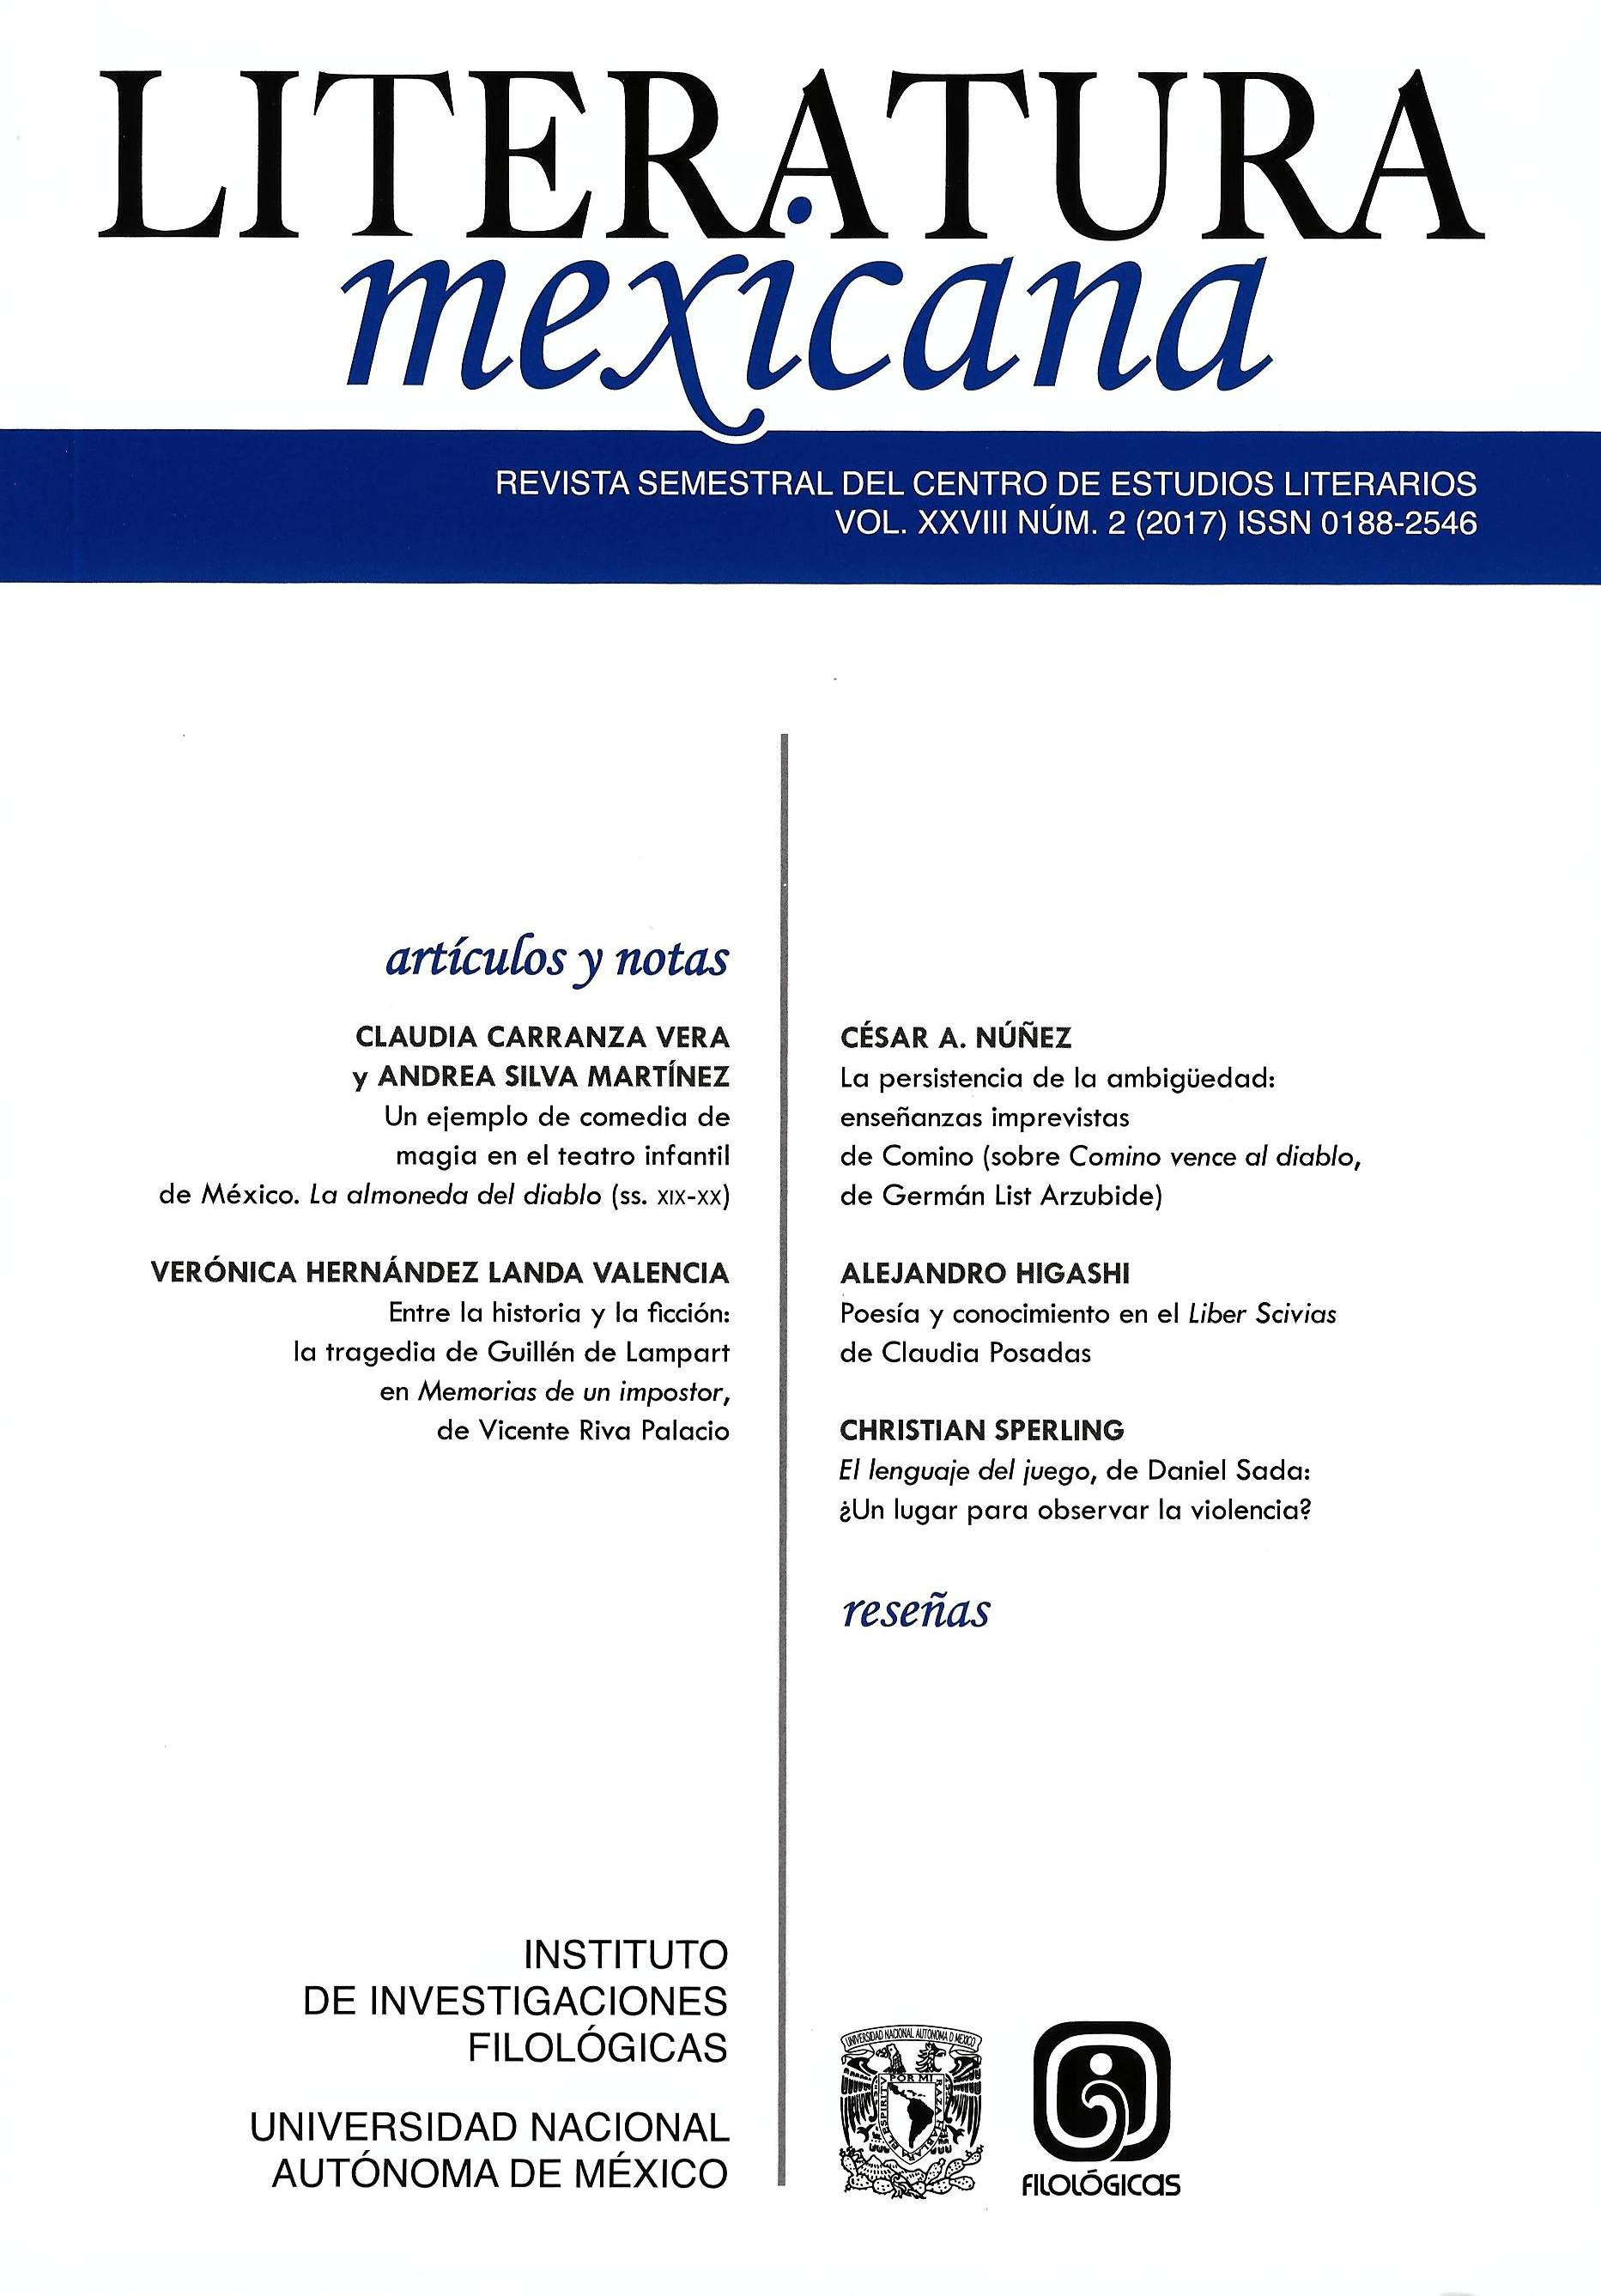 Literatura Mexicana, vol. XXVIII, núm. 2 (2017)